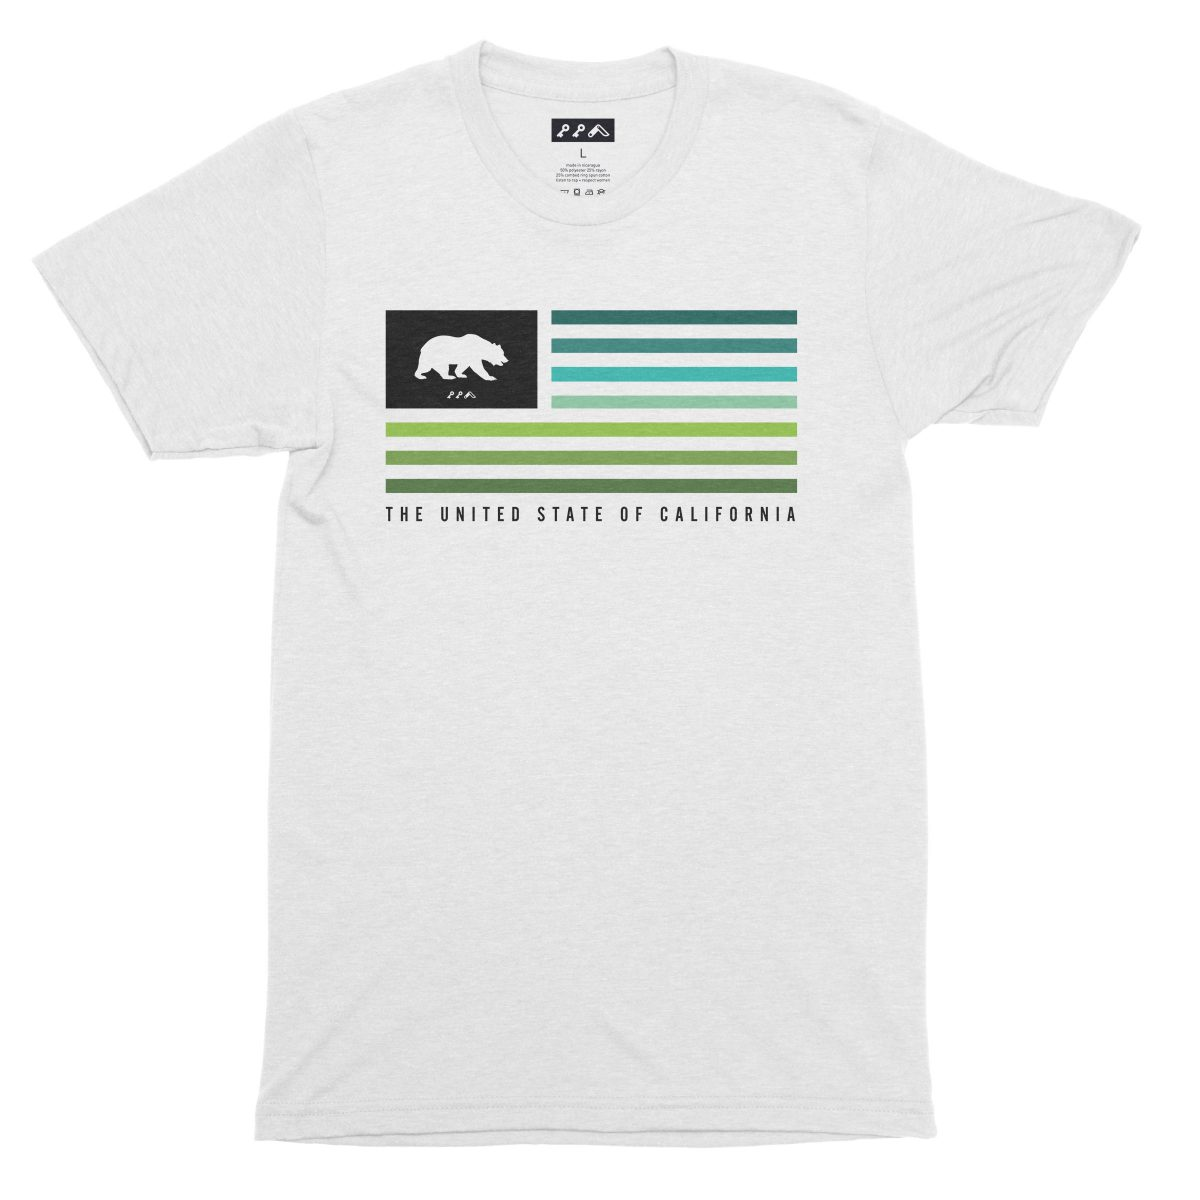 UNITED STATE OF CALIFORNIA music festival summer beach tshirt in white fleck